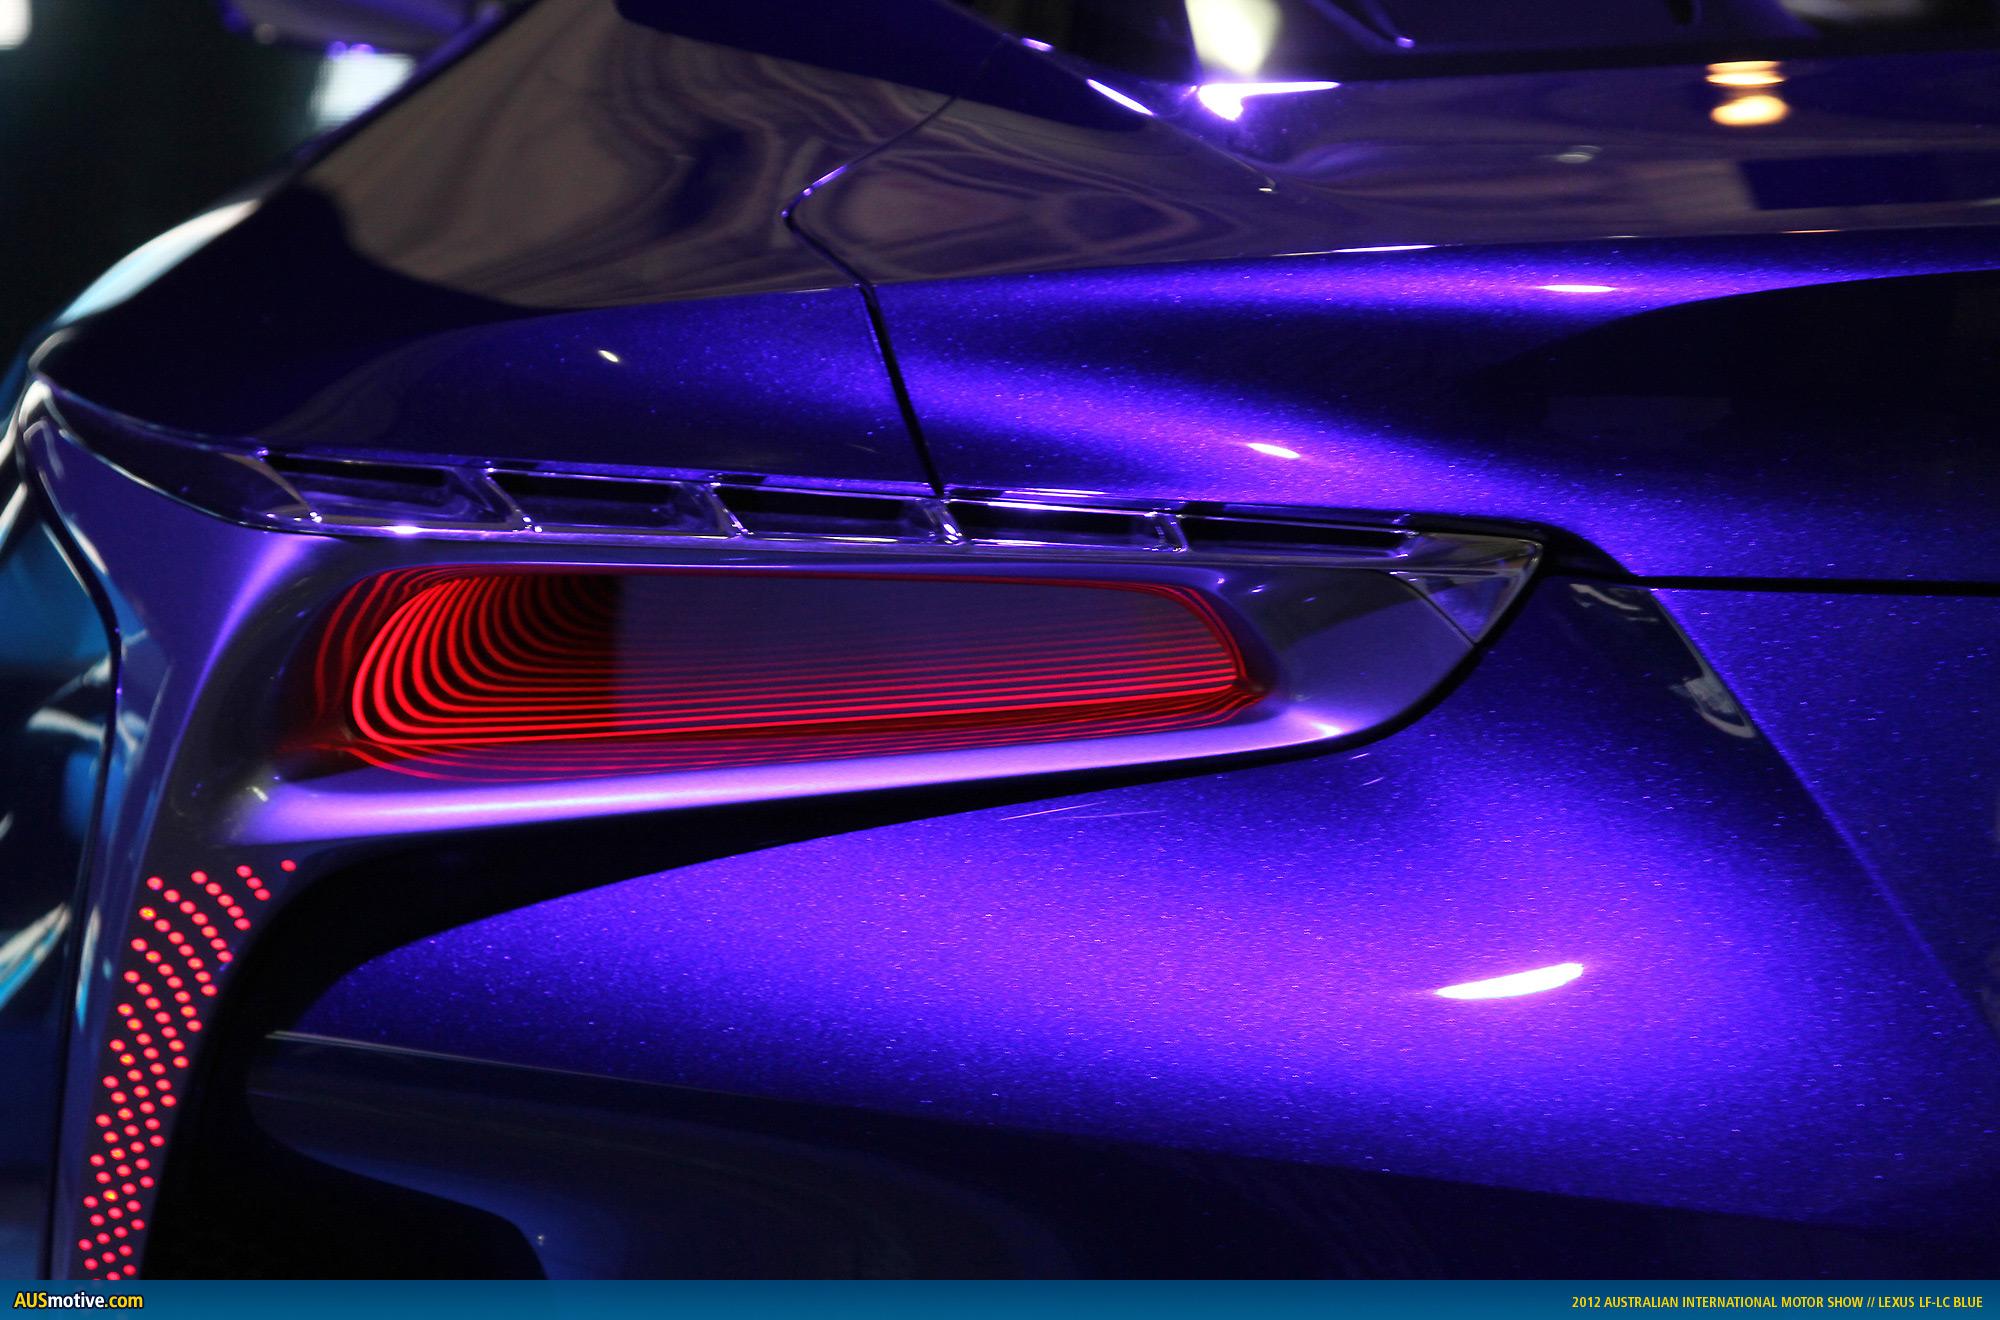 http://www.ausmotive.com/pics/2012/AIMS/Lexus-LF-LC-06.jpg